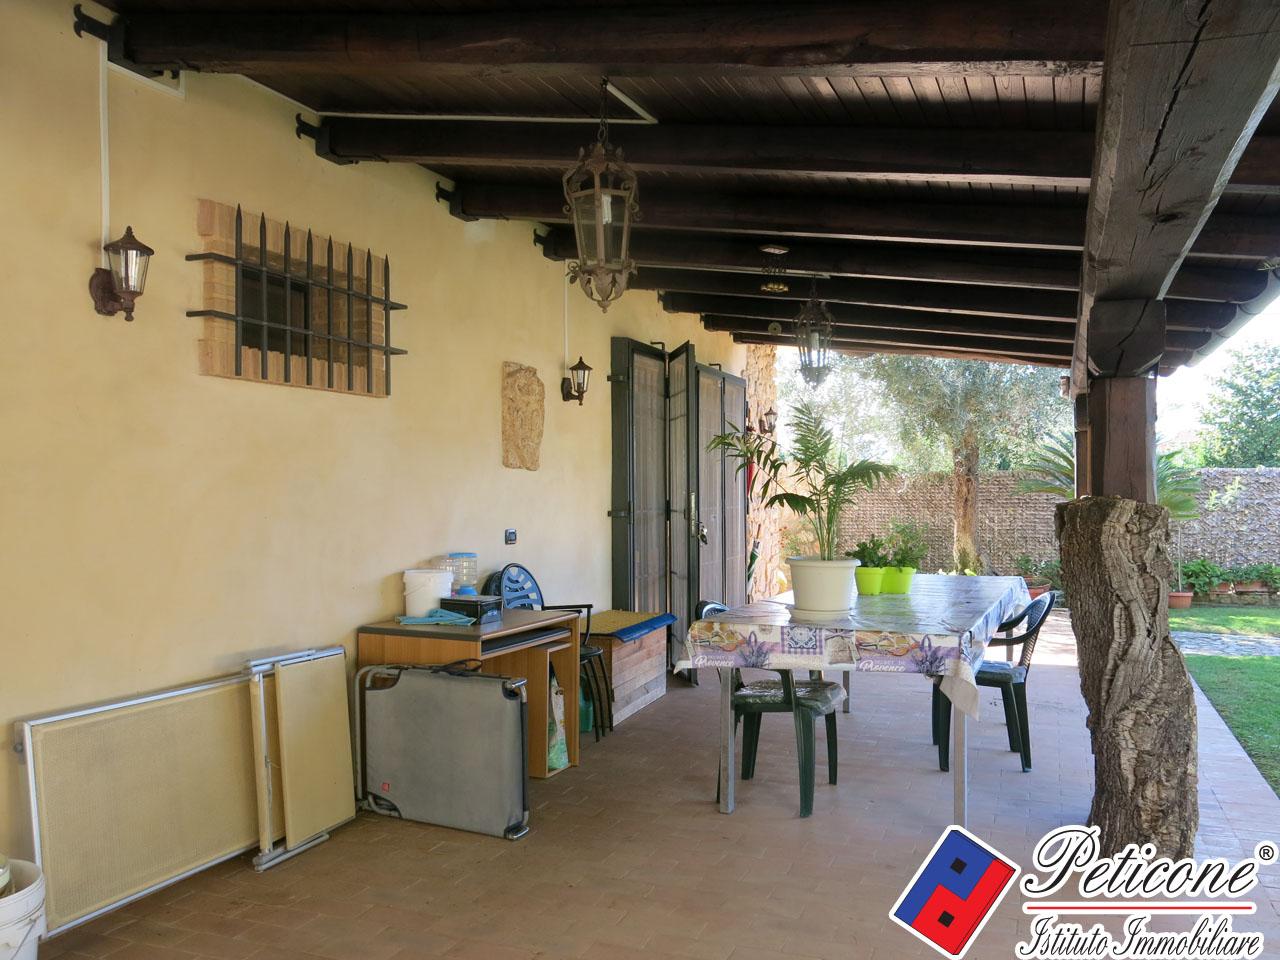 Villa in Vendita a Fondi: 3 locali, 107 mq - Foto 13